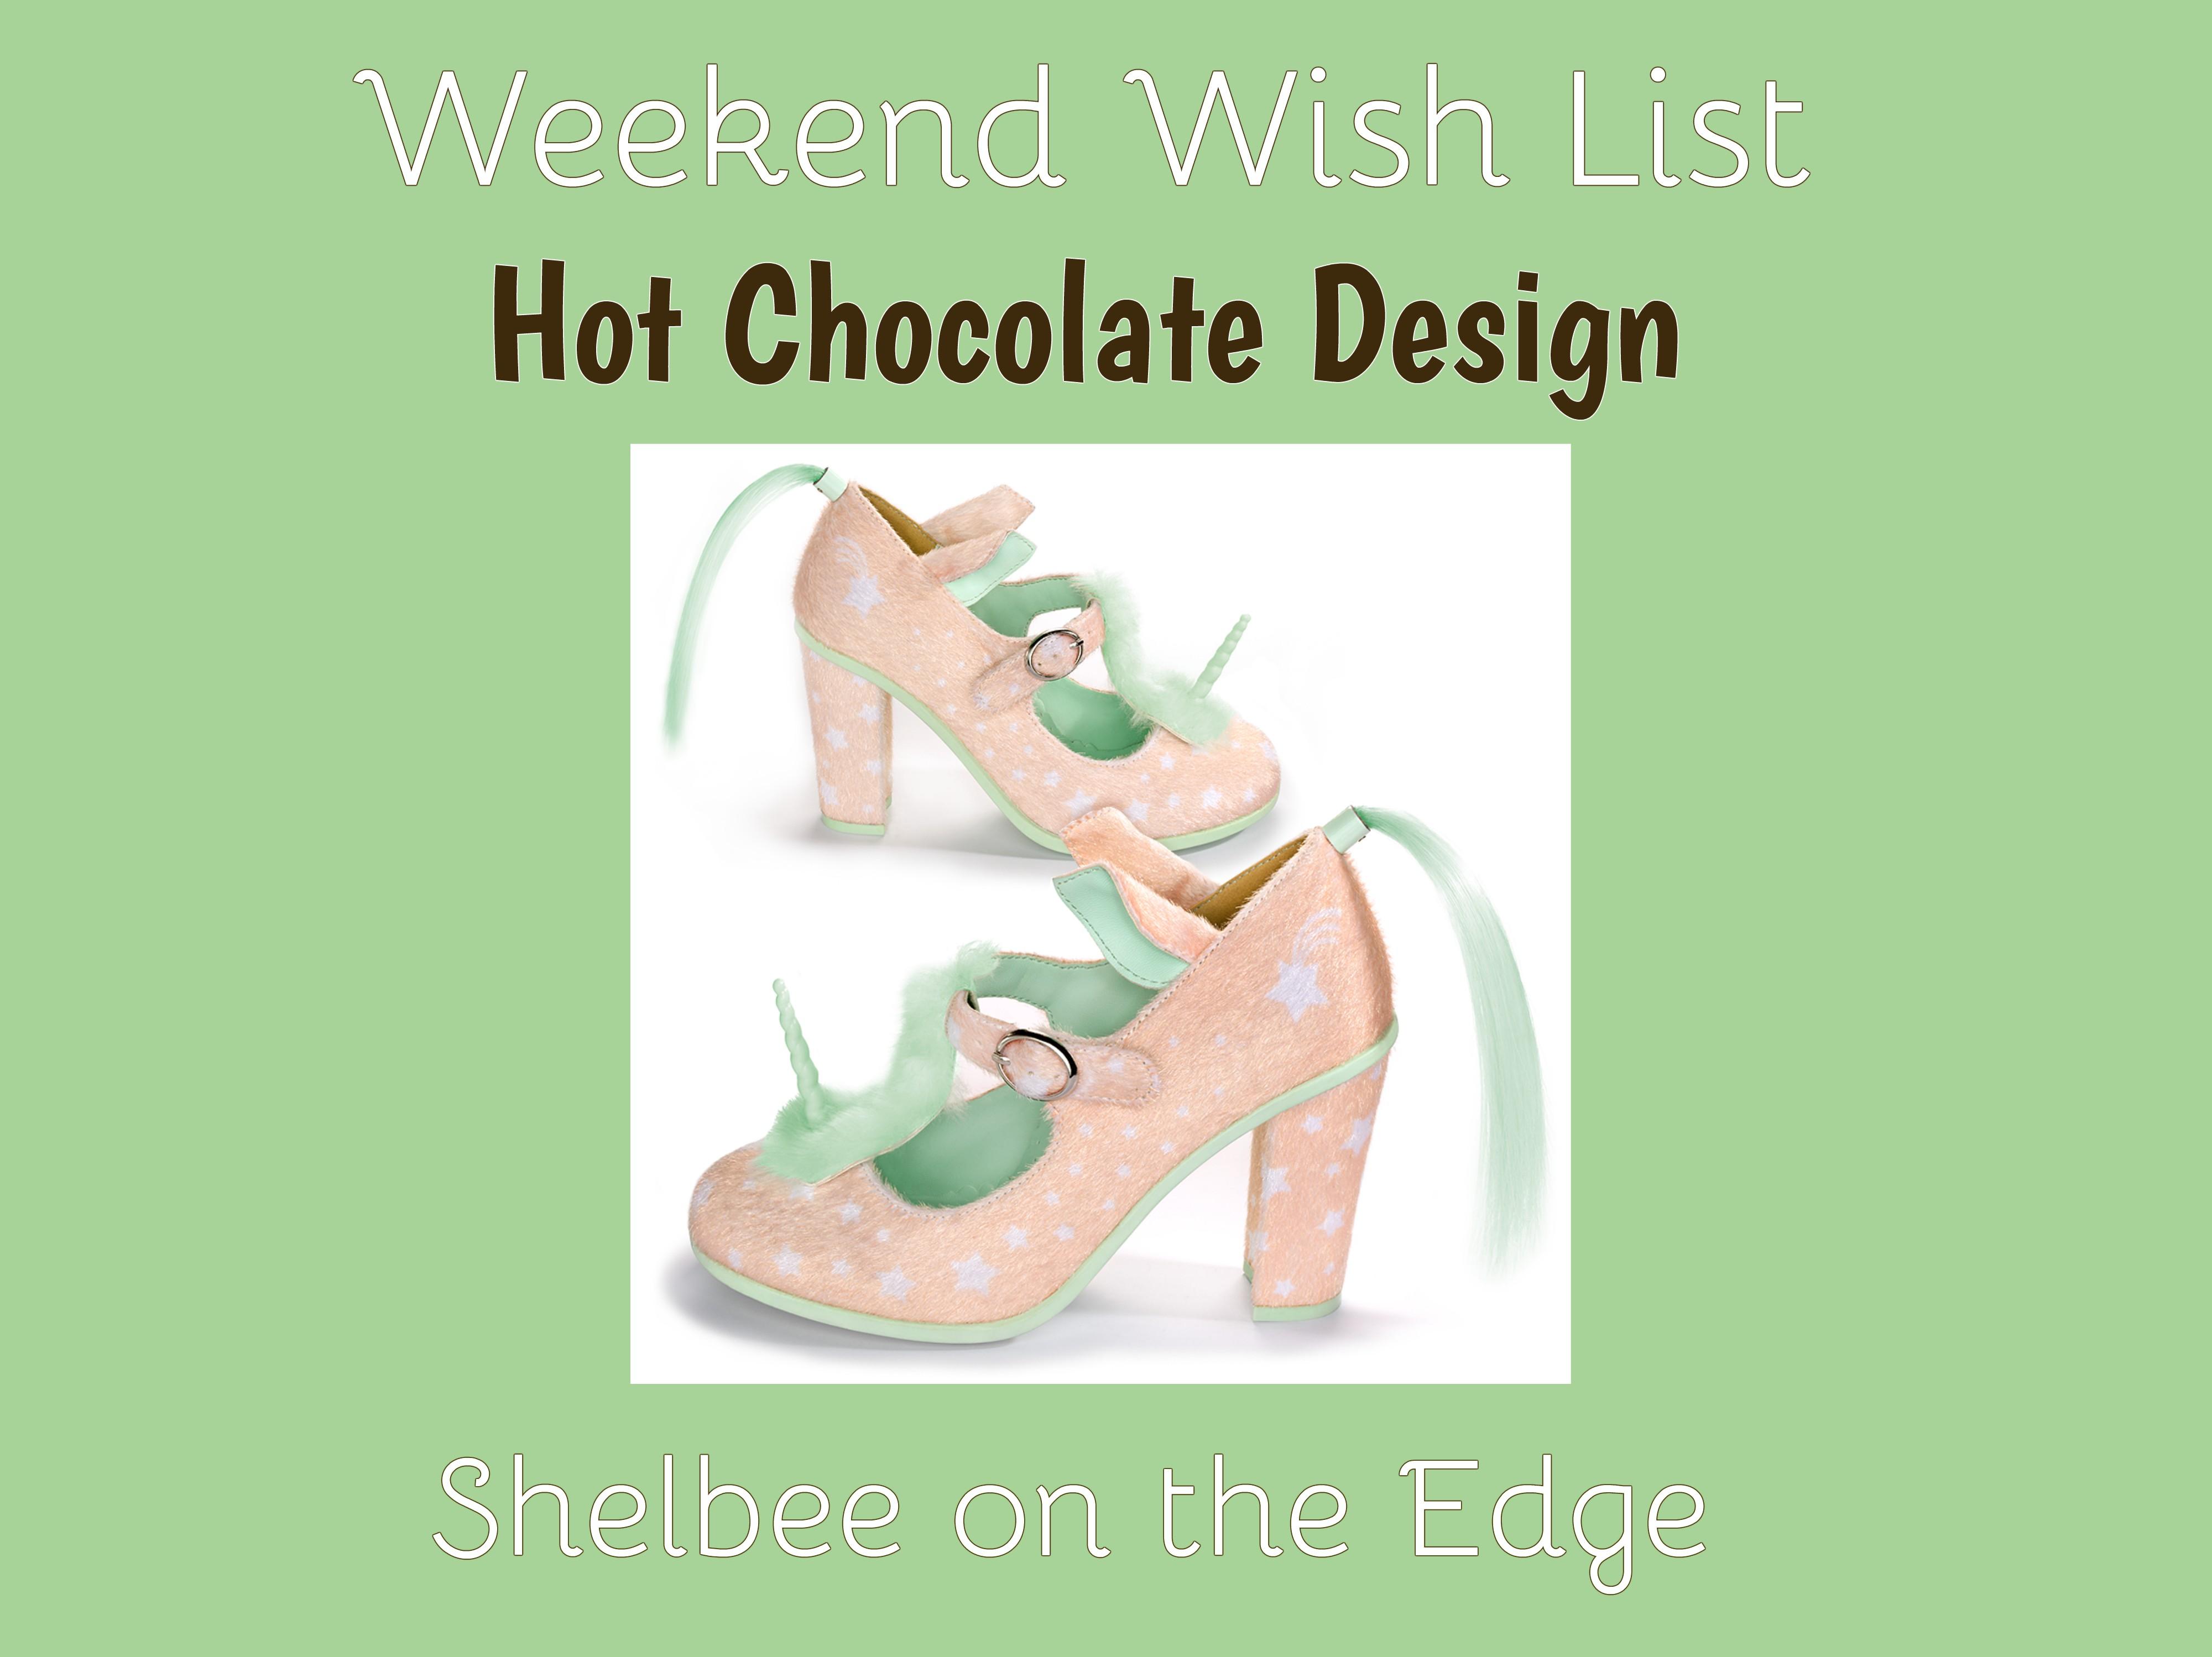 Weekend Wish List: Hot Chocolate Design